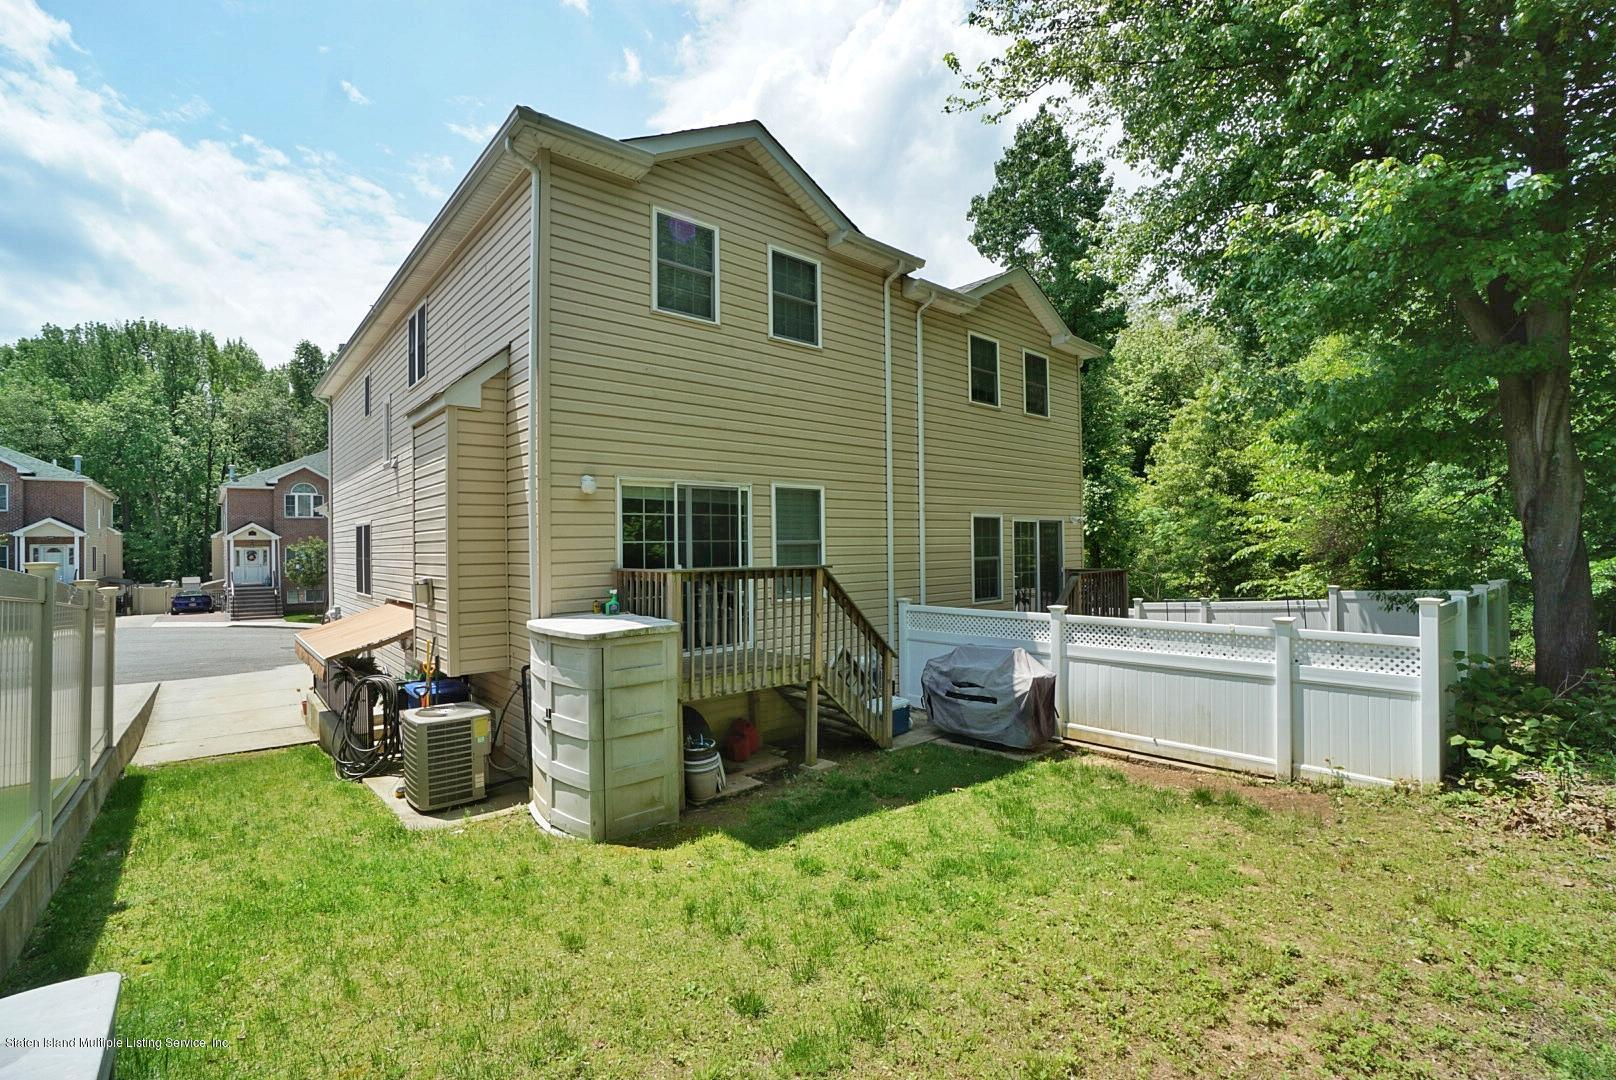 Two Family - Semi-Attached 27 Malibu Court  Staten Island, NY 10309, MLS-1129104-45